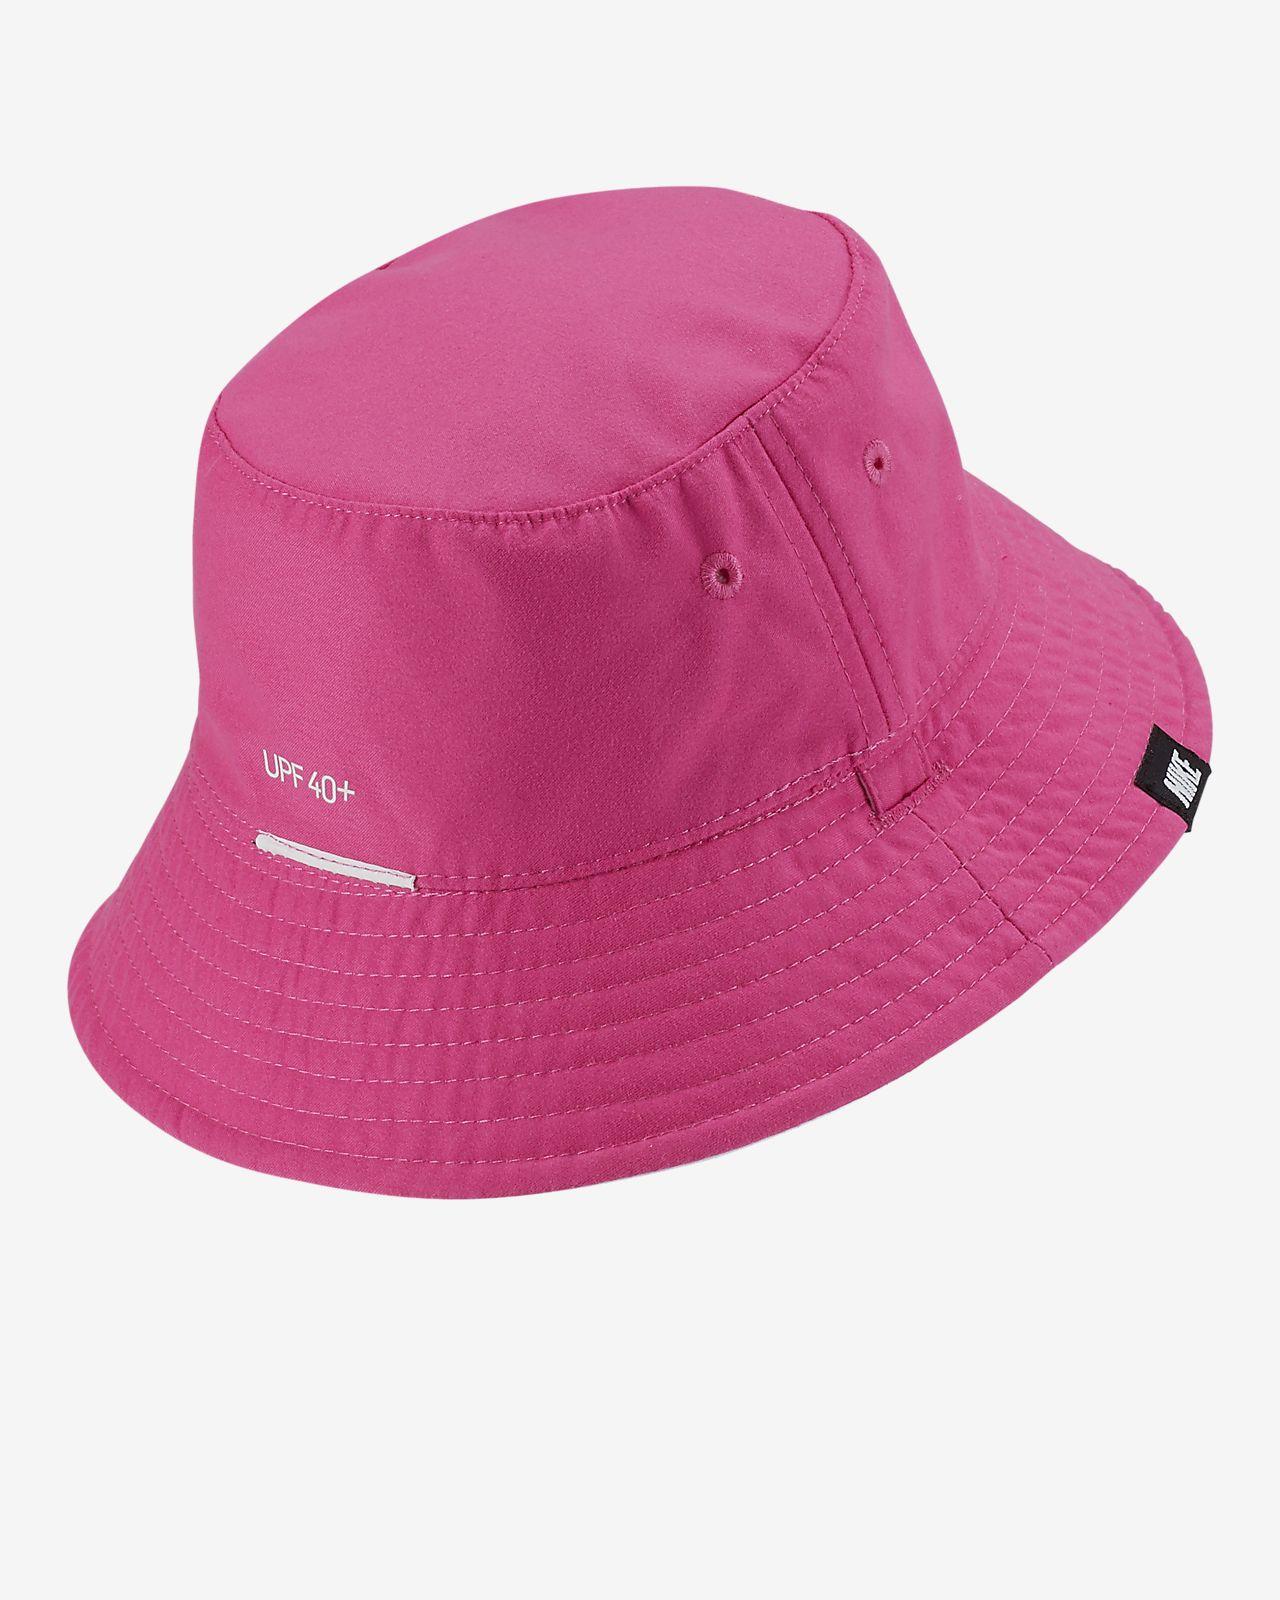 d4a66f7ff7d Nike Dri-FIT Toddler Reversible Bucket Hat. Nike.com